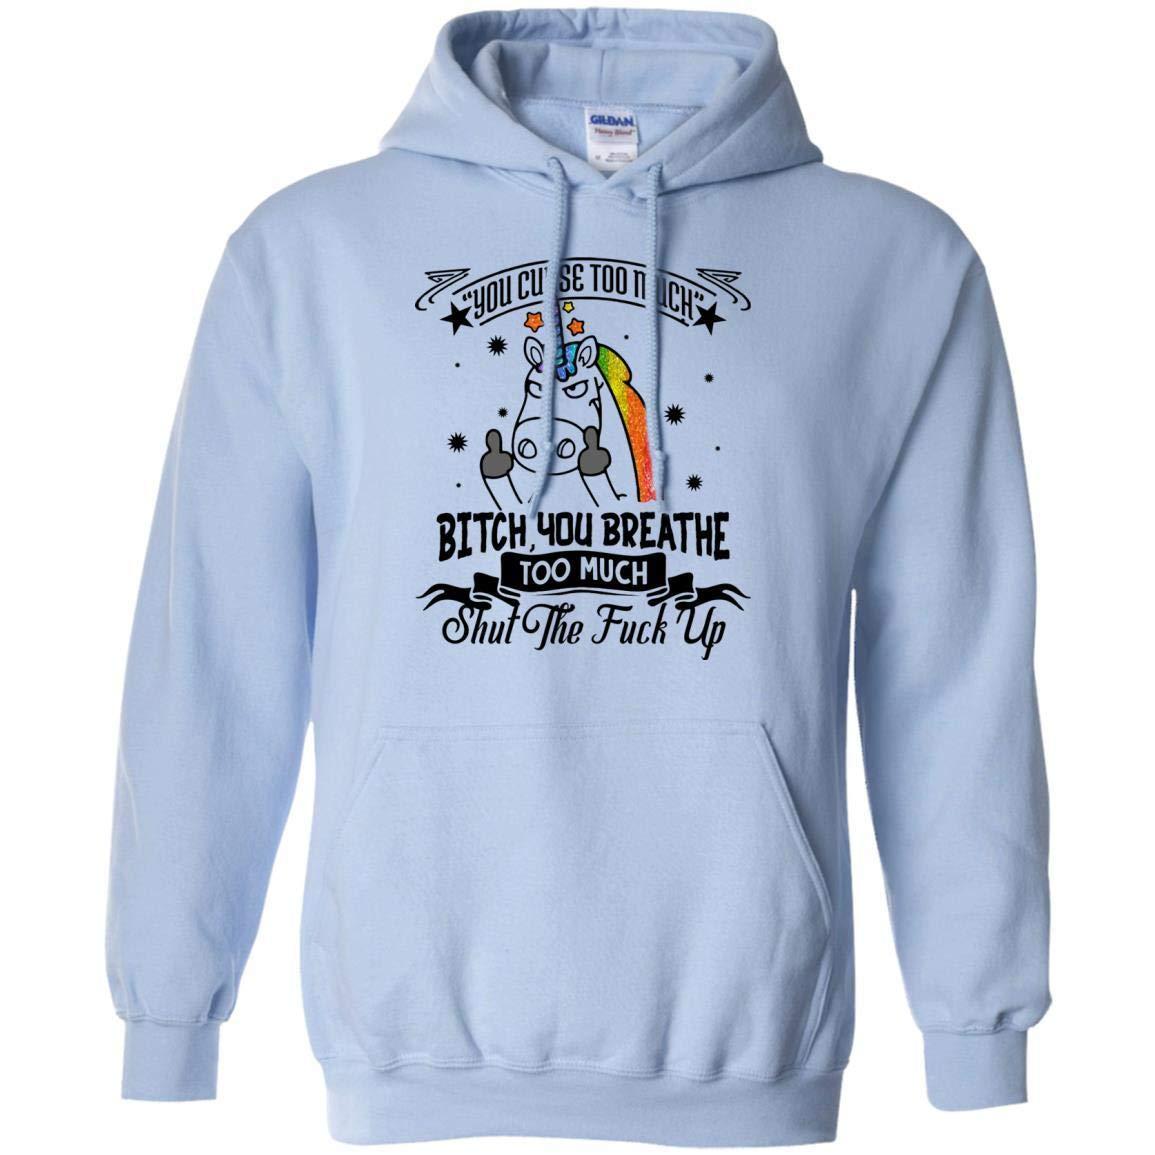 KeyVic You Curse Too Much Bitch You Breathe Too Much Shut The Fuck Off Unicorn Hoodie - Long Sleeve - Sweatshirt